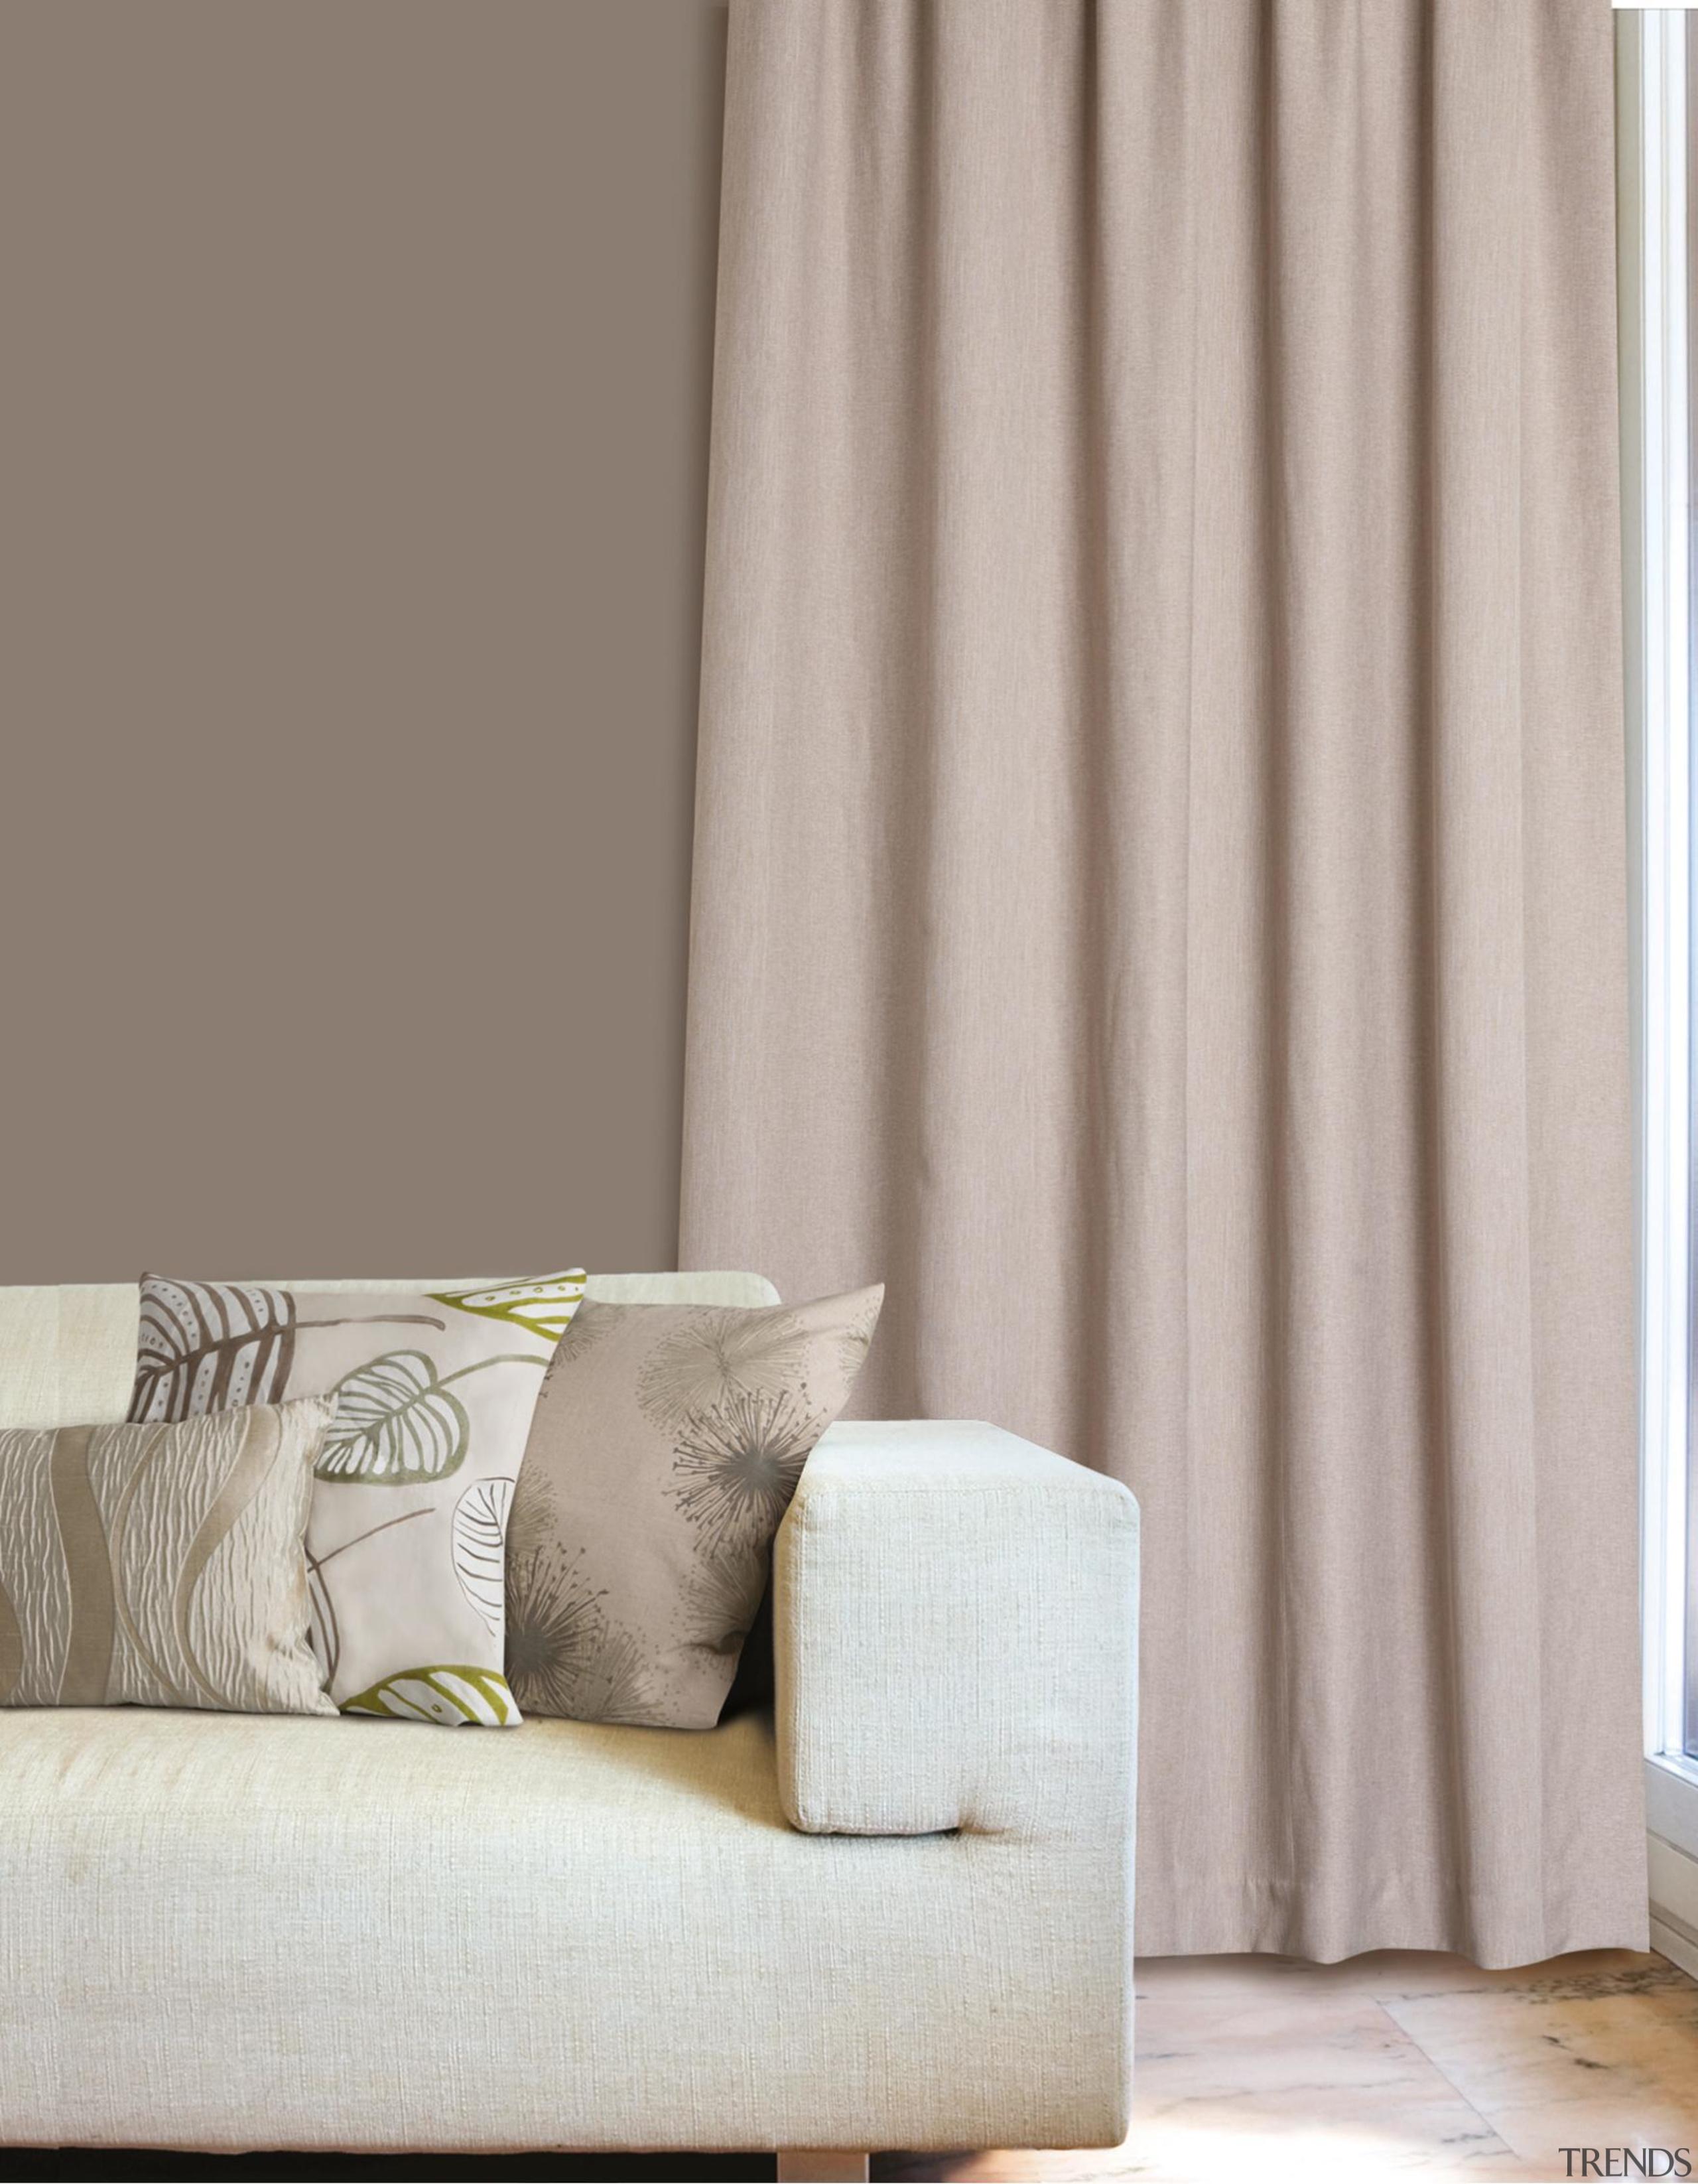 Haven 1 - curtain | decor | interior curtain, decor, interior design, living room, textile, window, window covering, window treatment, gray